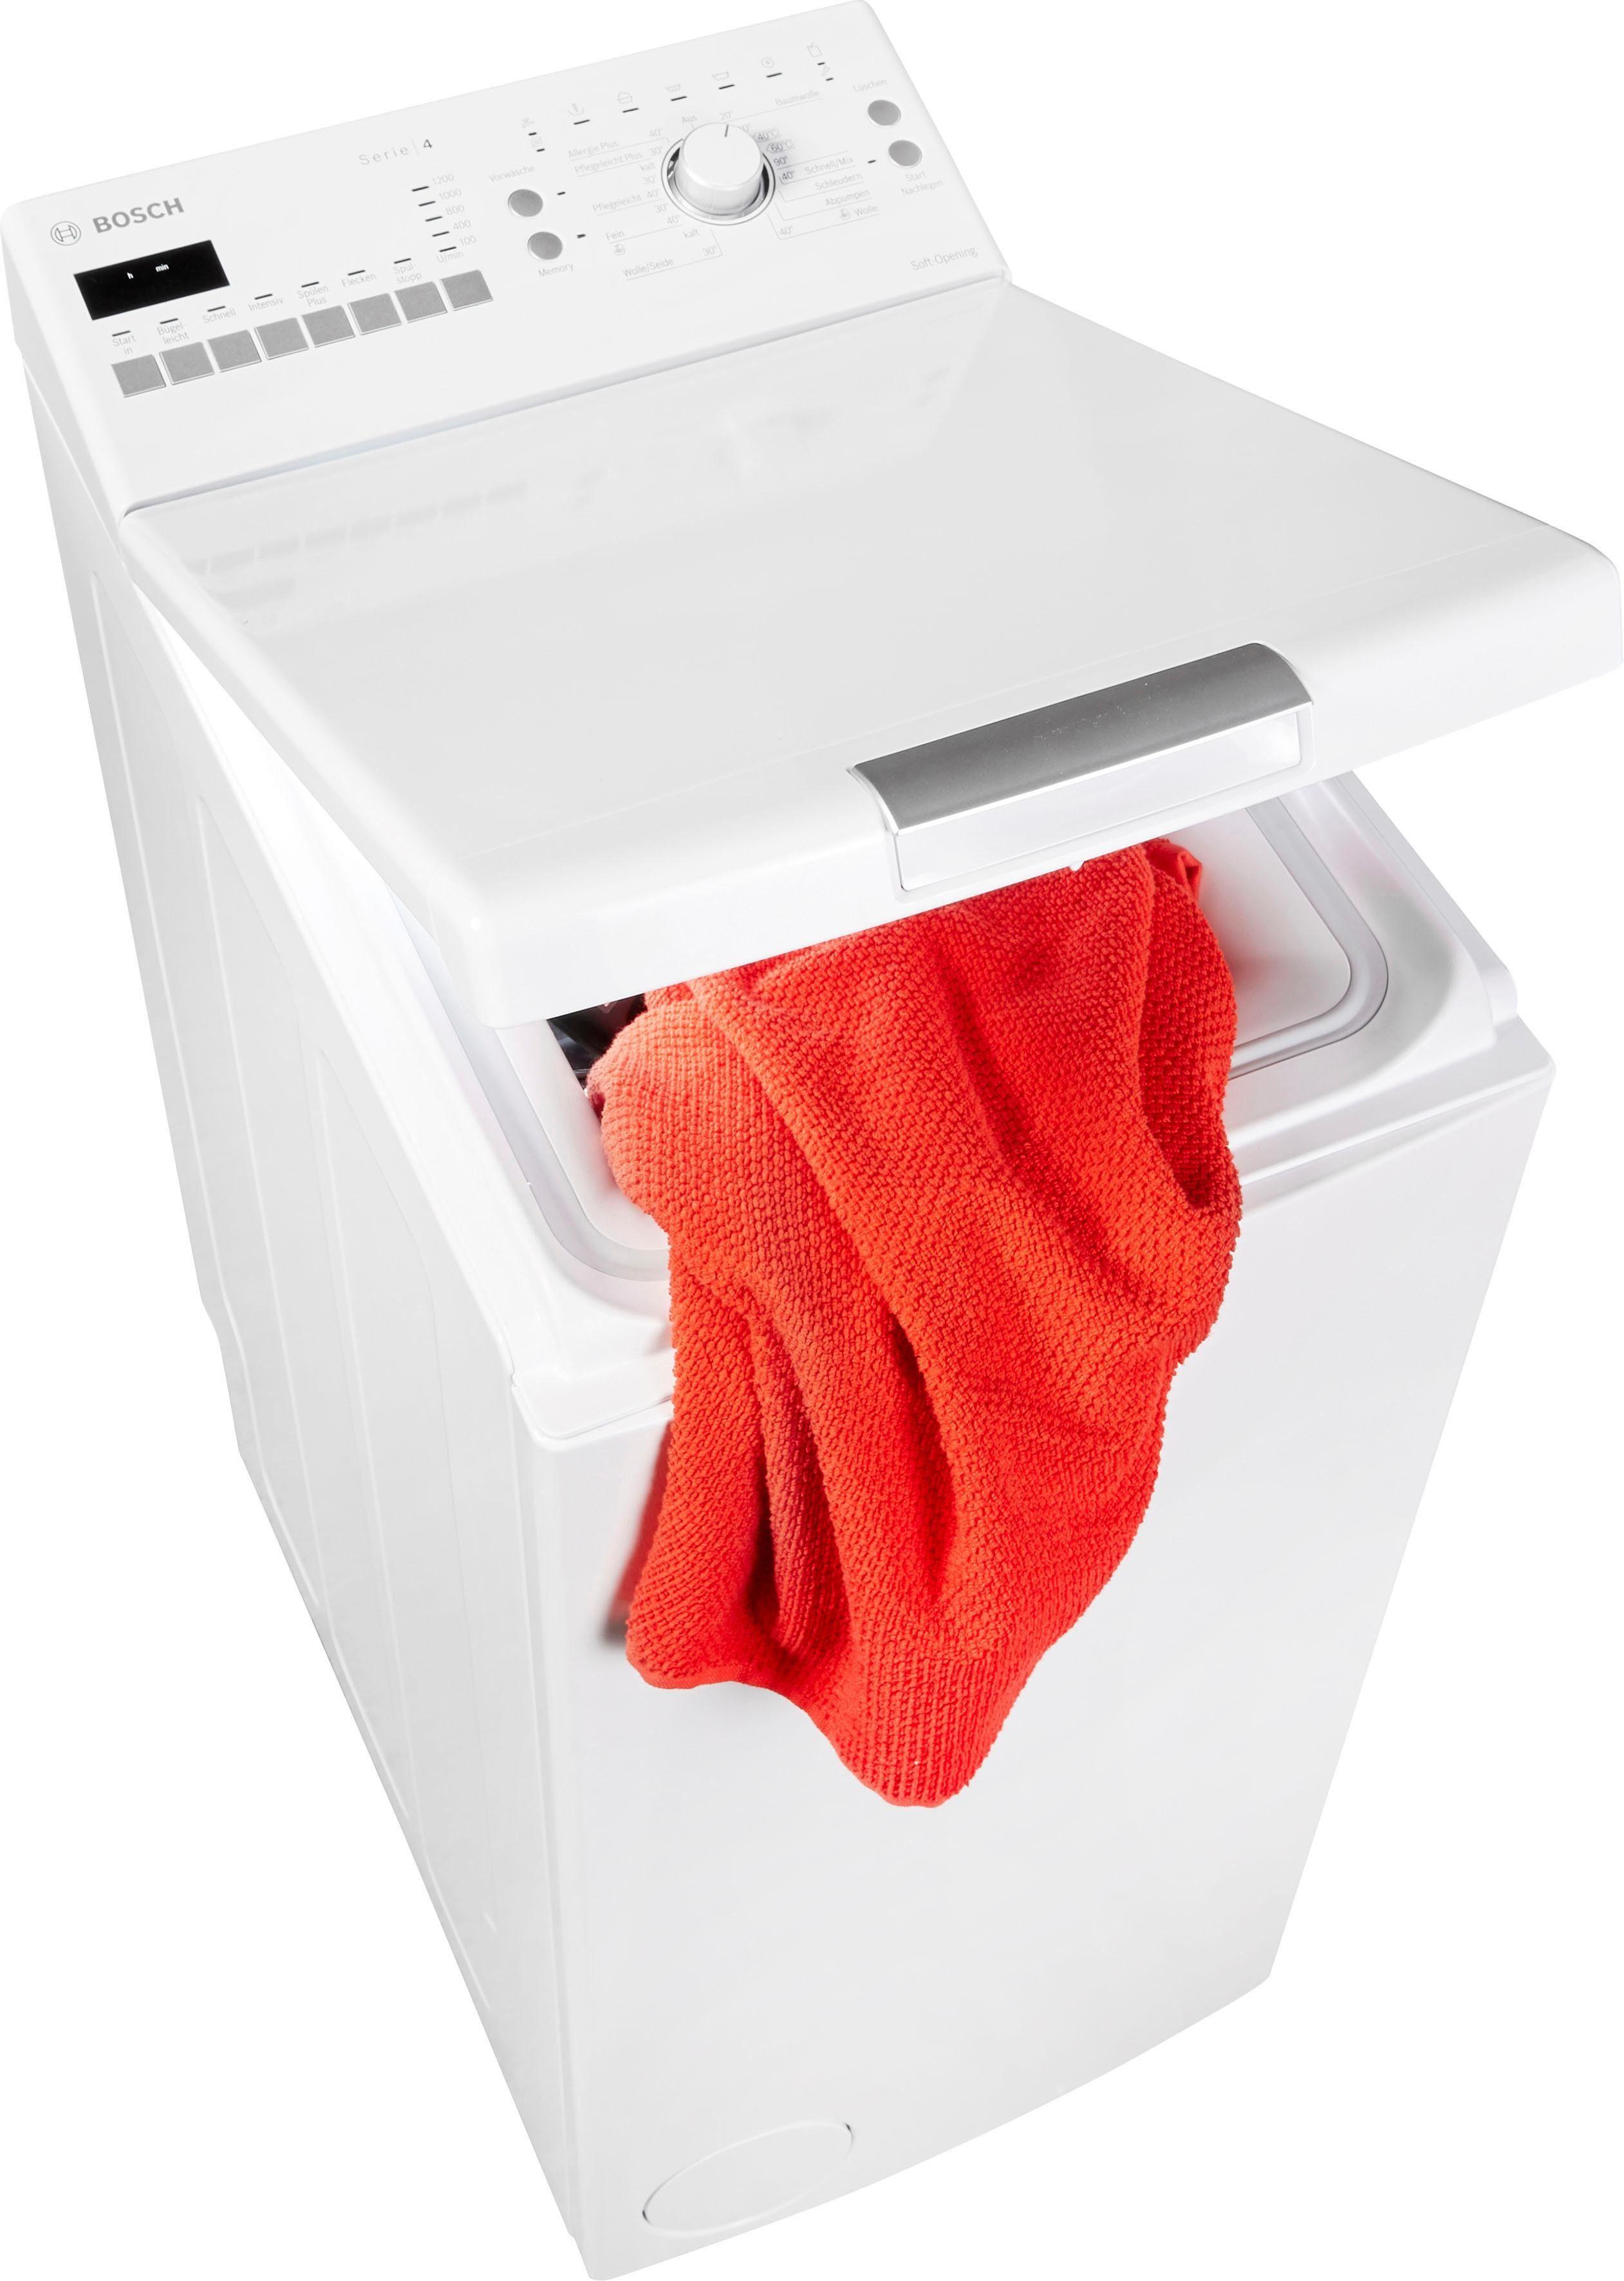 BOSCH Waschmaschine Toplader 4 WOT24227, 7 kg, 1200 U/Min